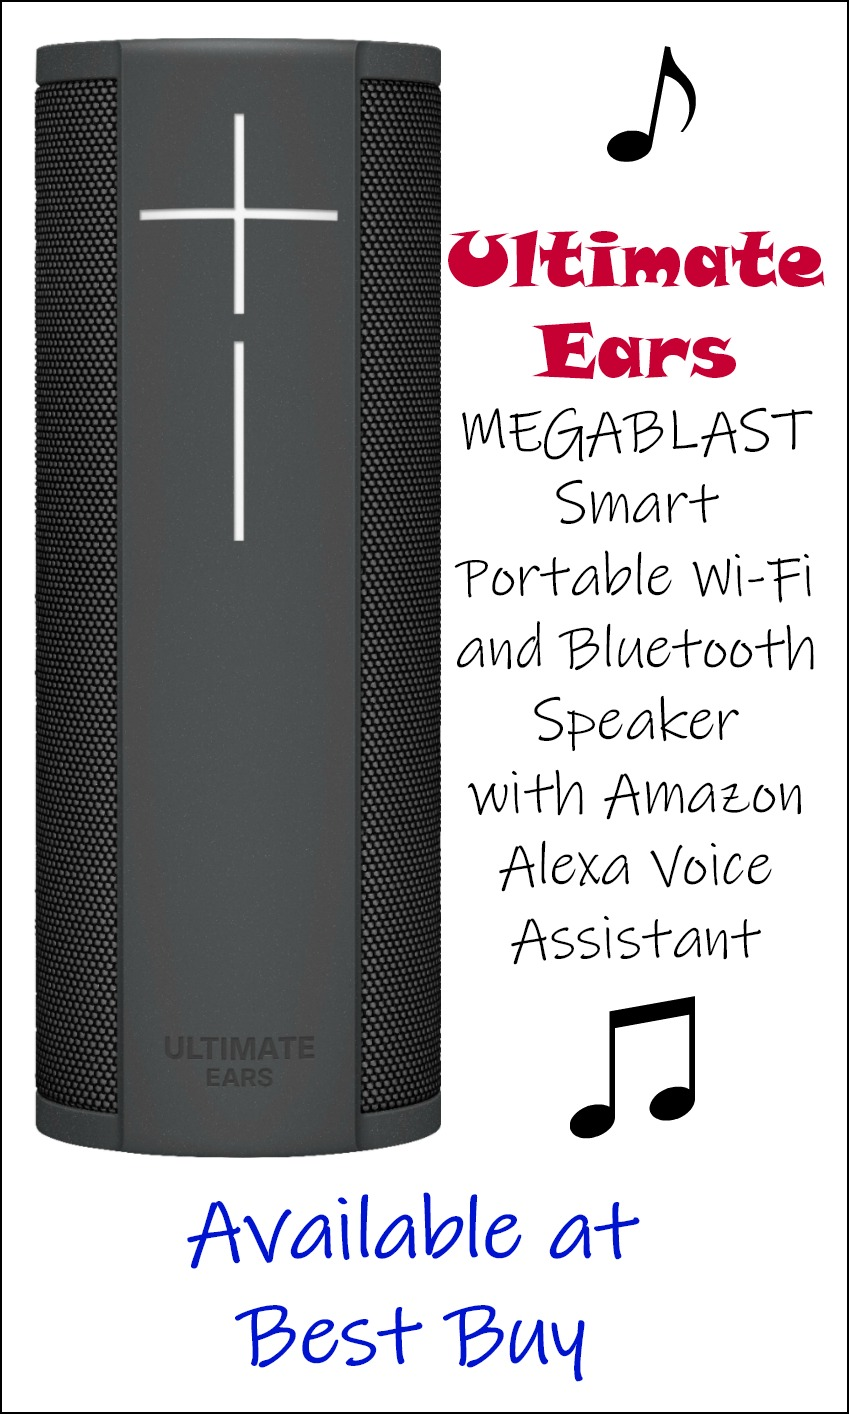 Ultimate Ears - MEGABLAST Smart Portable Wi-Fi and Bluetooth Speaker with Amazon Alexa Voice Assistant